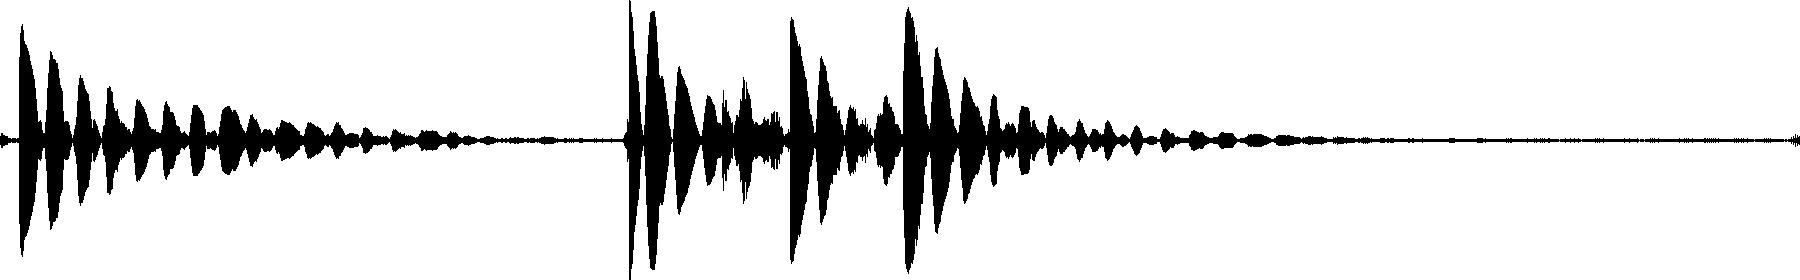 114 tremolo guitar b